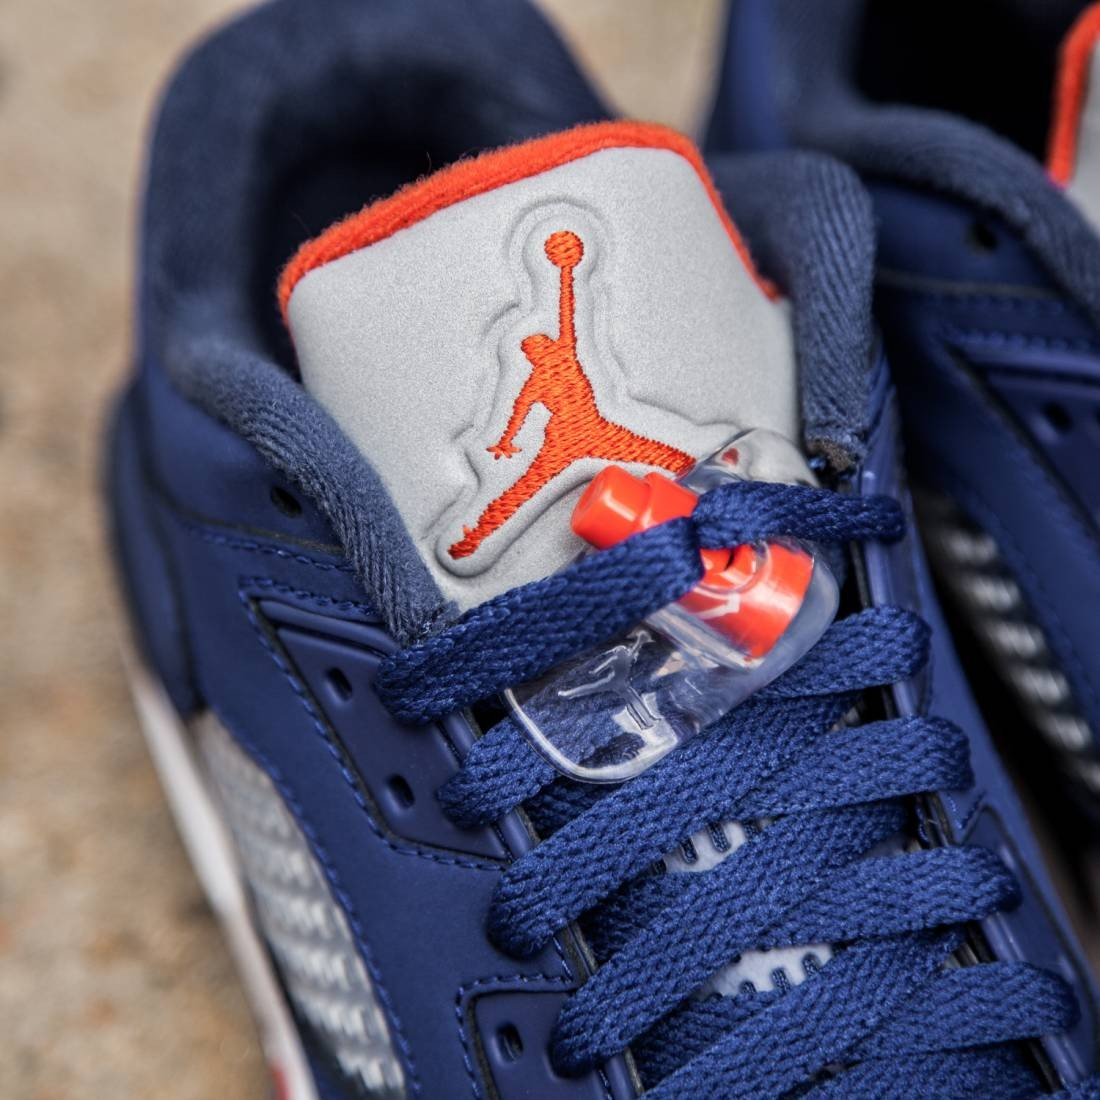 separation shoes 8d557 00a67 Air Jordan 5 Retro Low Knicks (GS) Big Kids (deep royal blue midnight navy  white team orange)